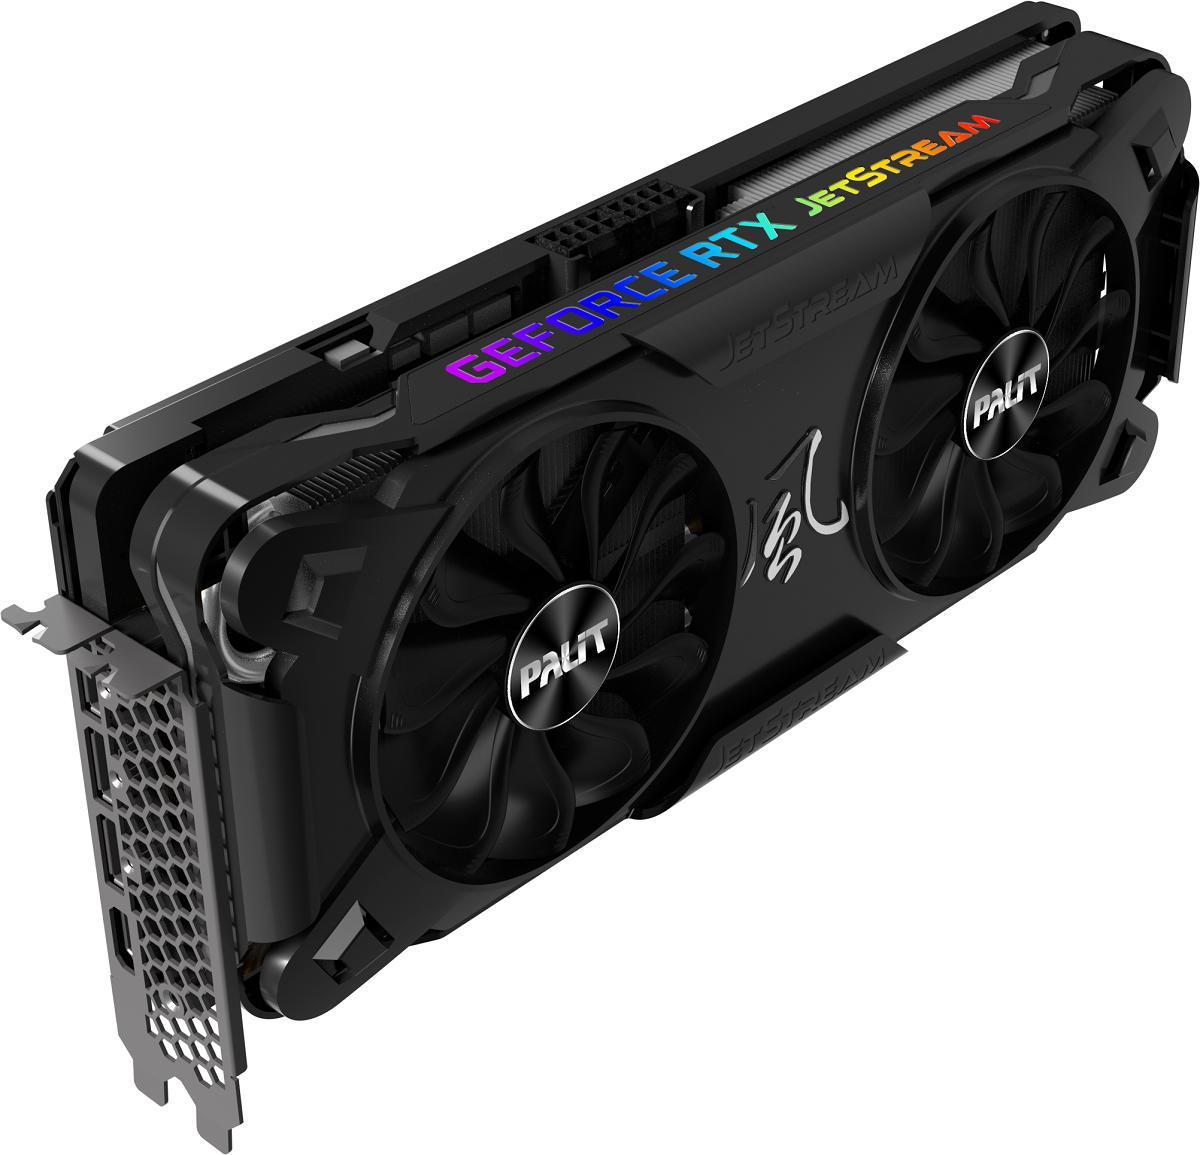 УPalit появились видеокарты GeForce RTX 3070